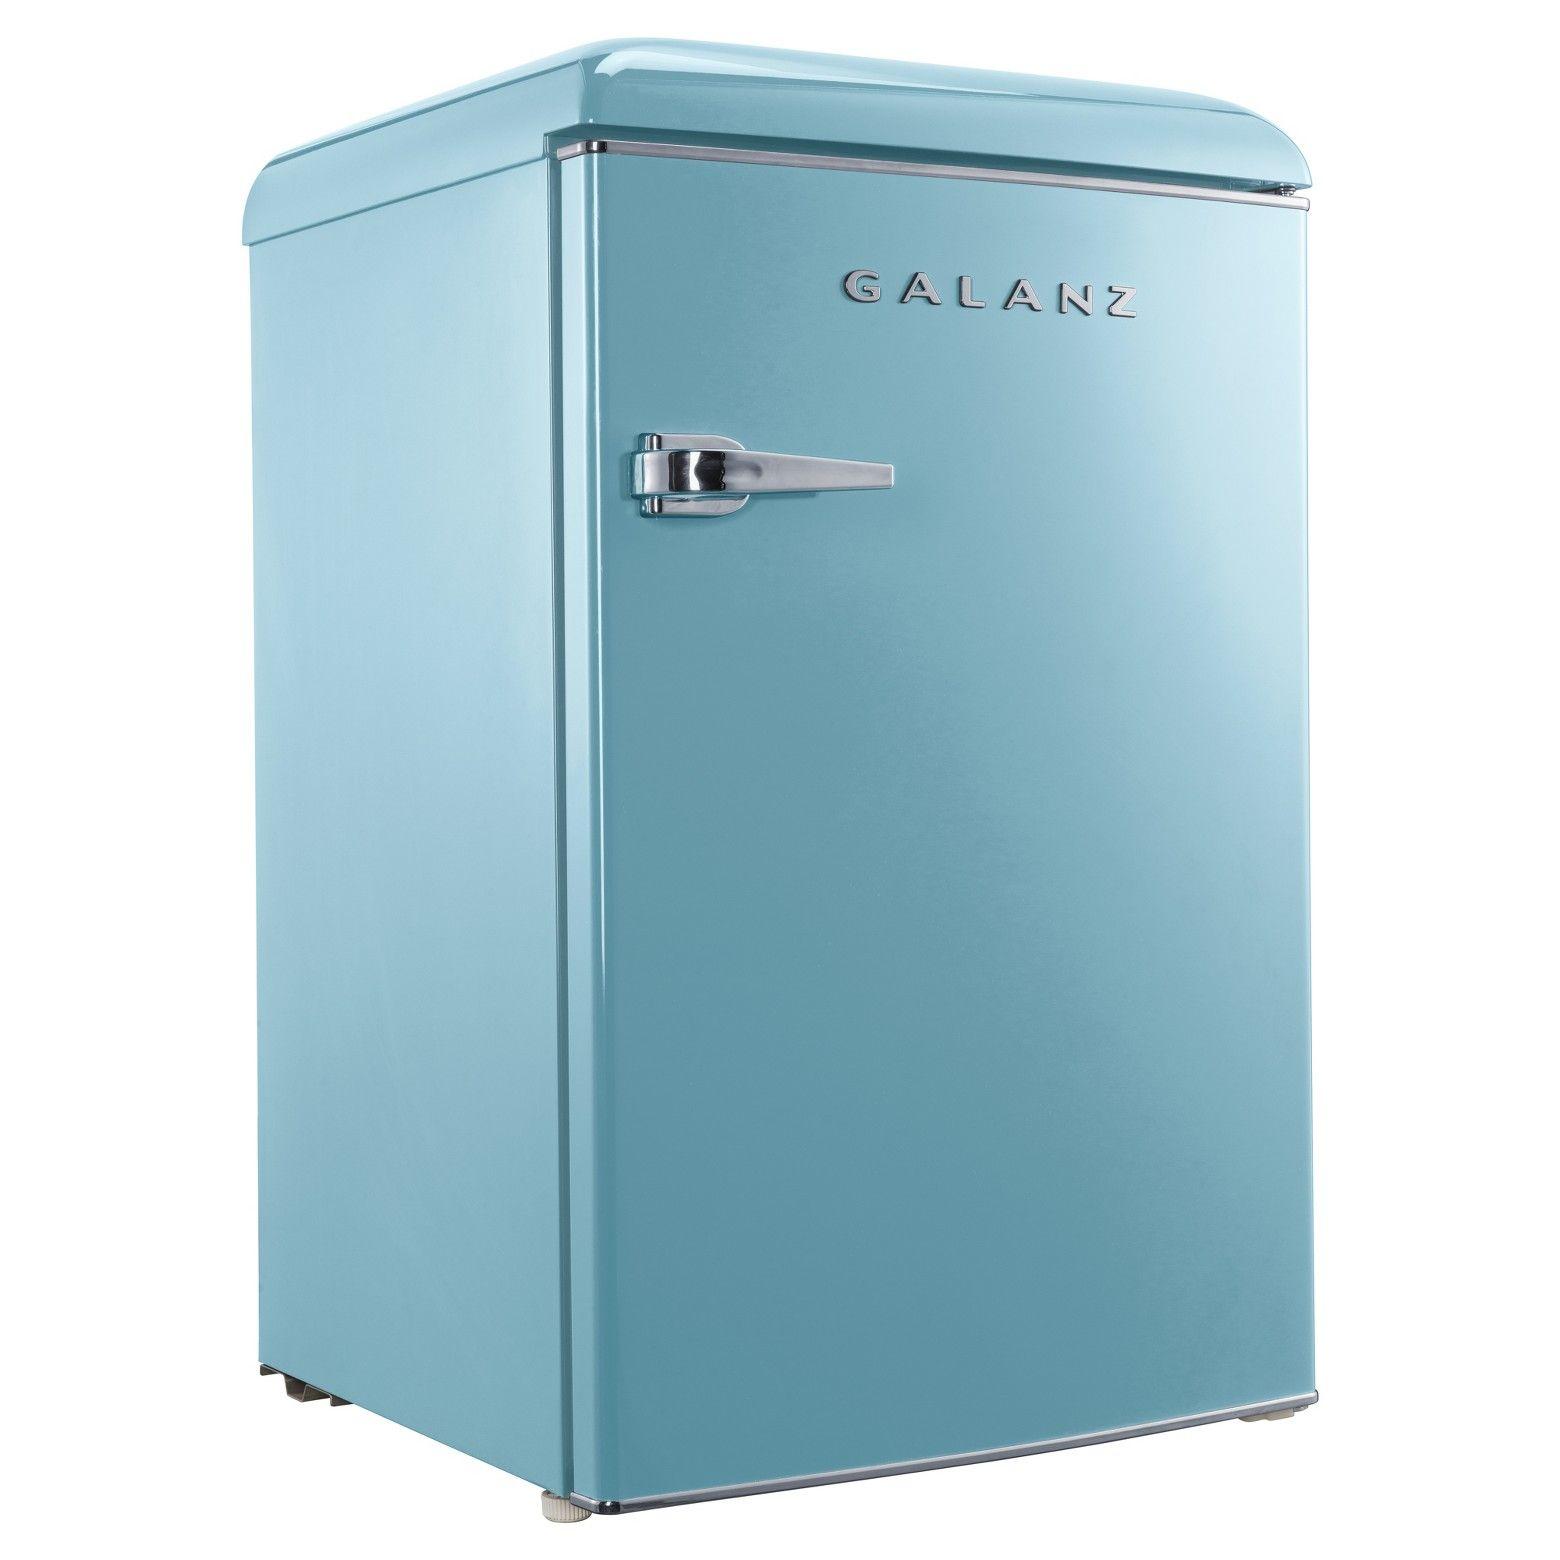 Make a statement with the Galanz 4.4 cu. ft. Retro Refrigerator ...